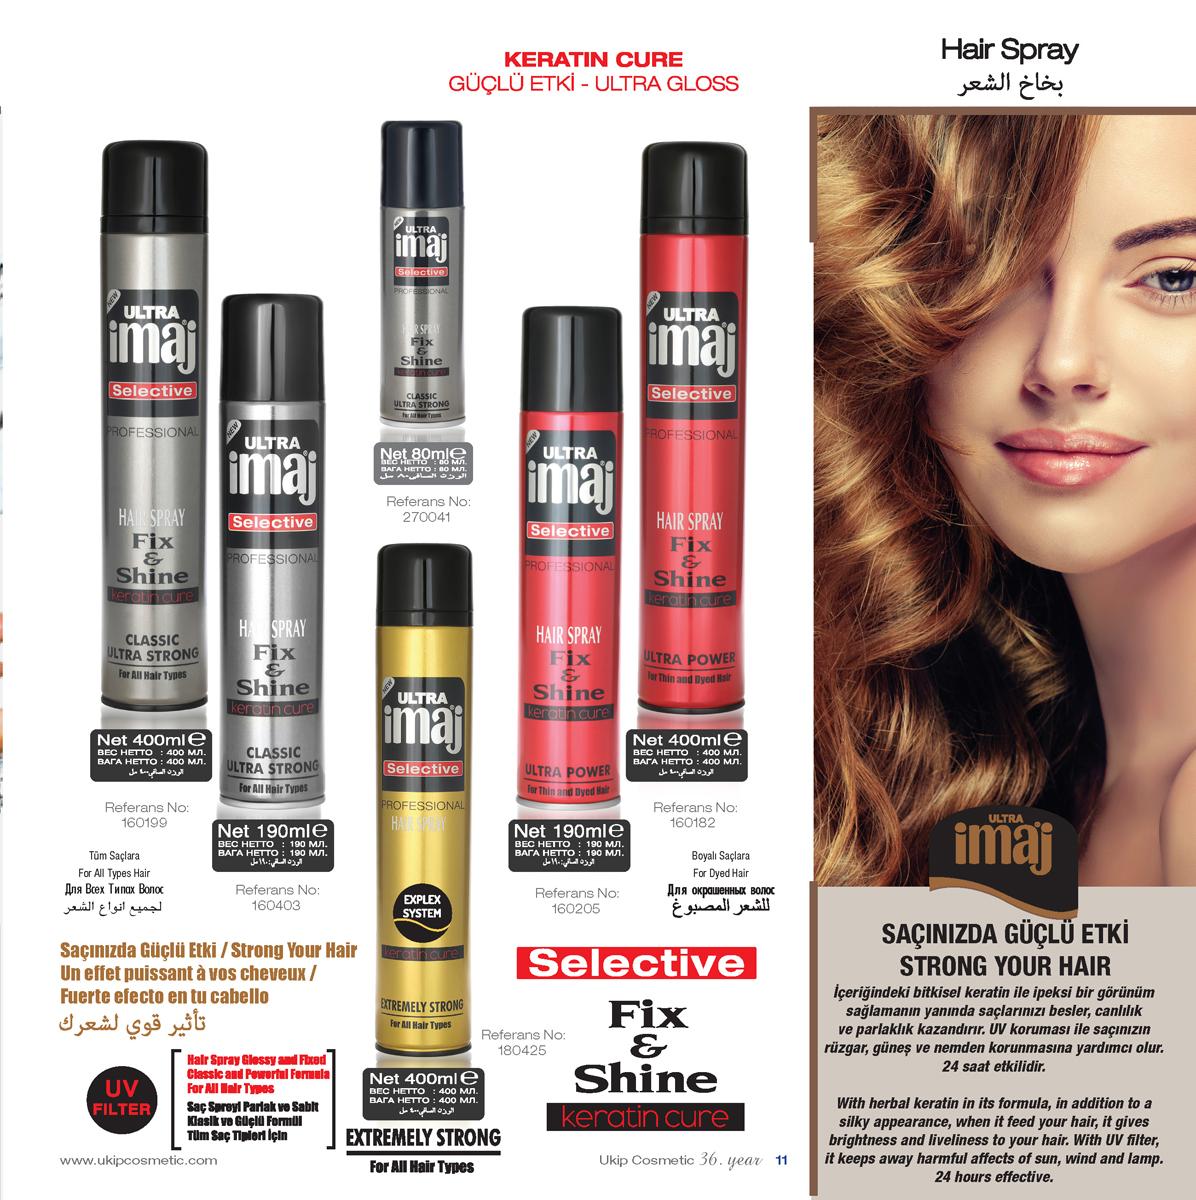 Imaj Ultra Hair Spray